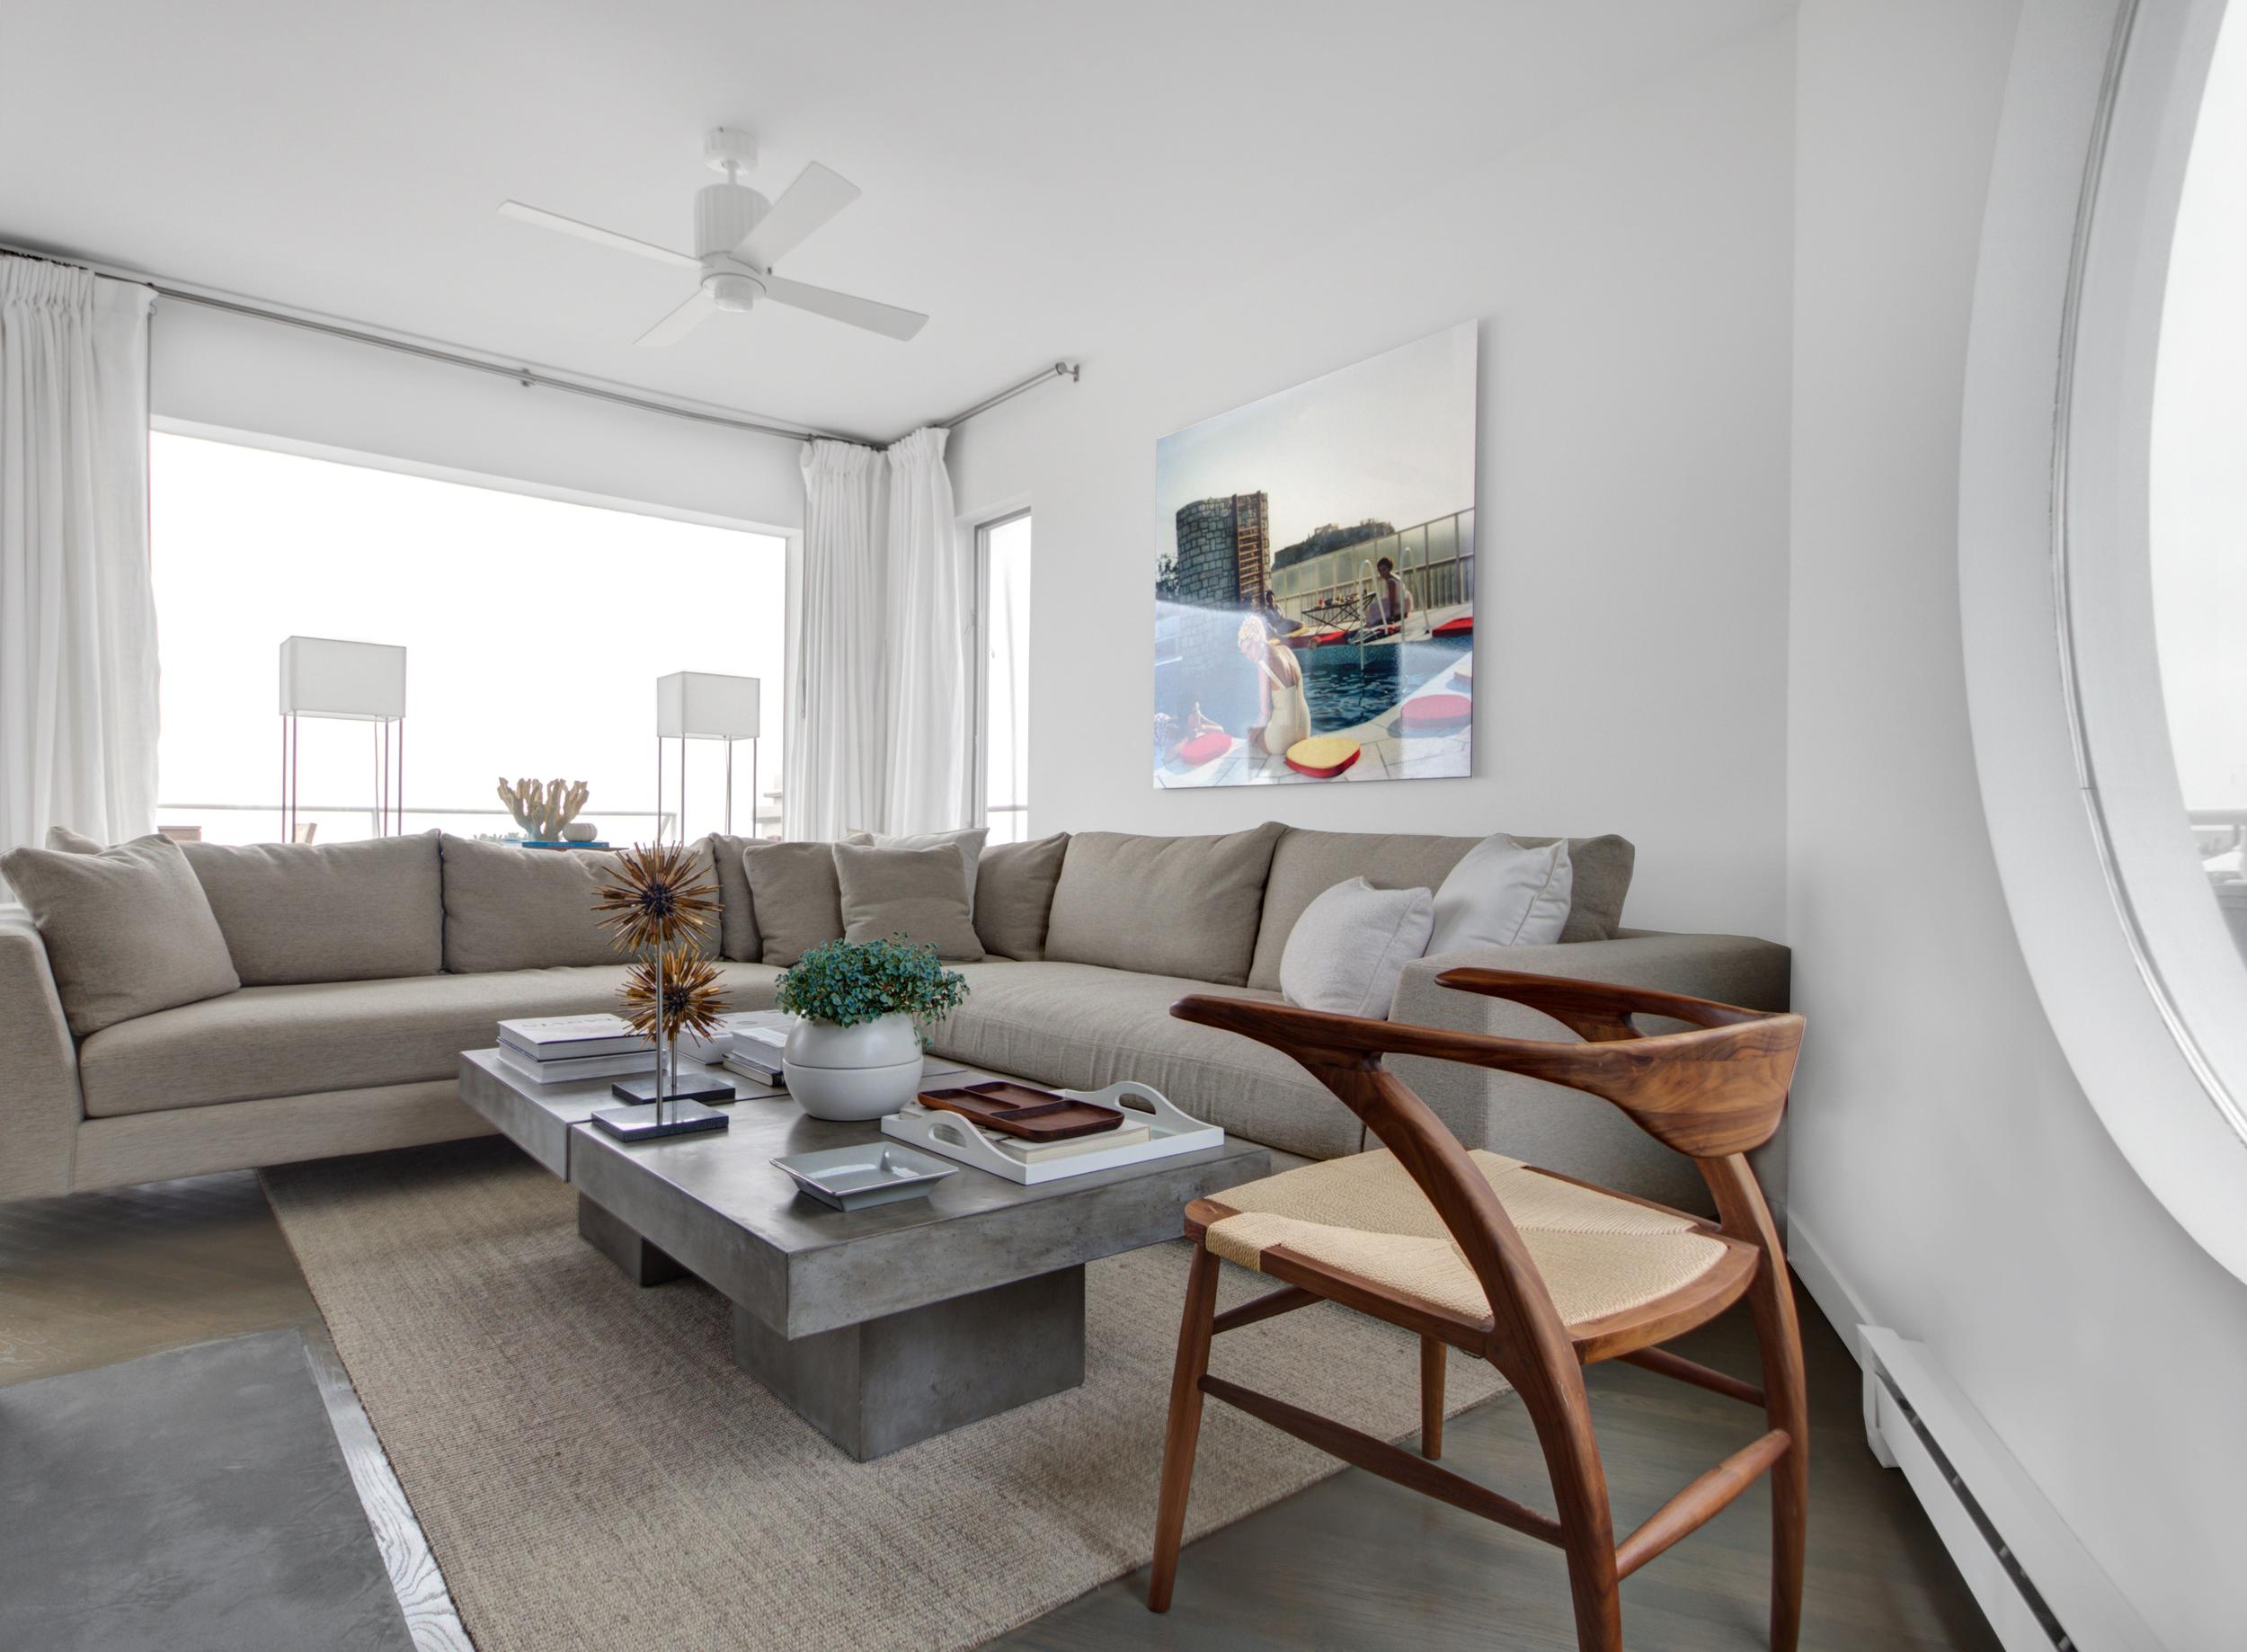 Schoeller + Darling Design - Amagansett Beach House - Living Room Lounge